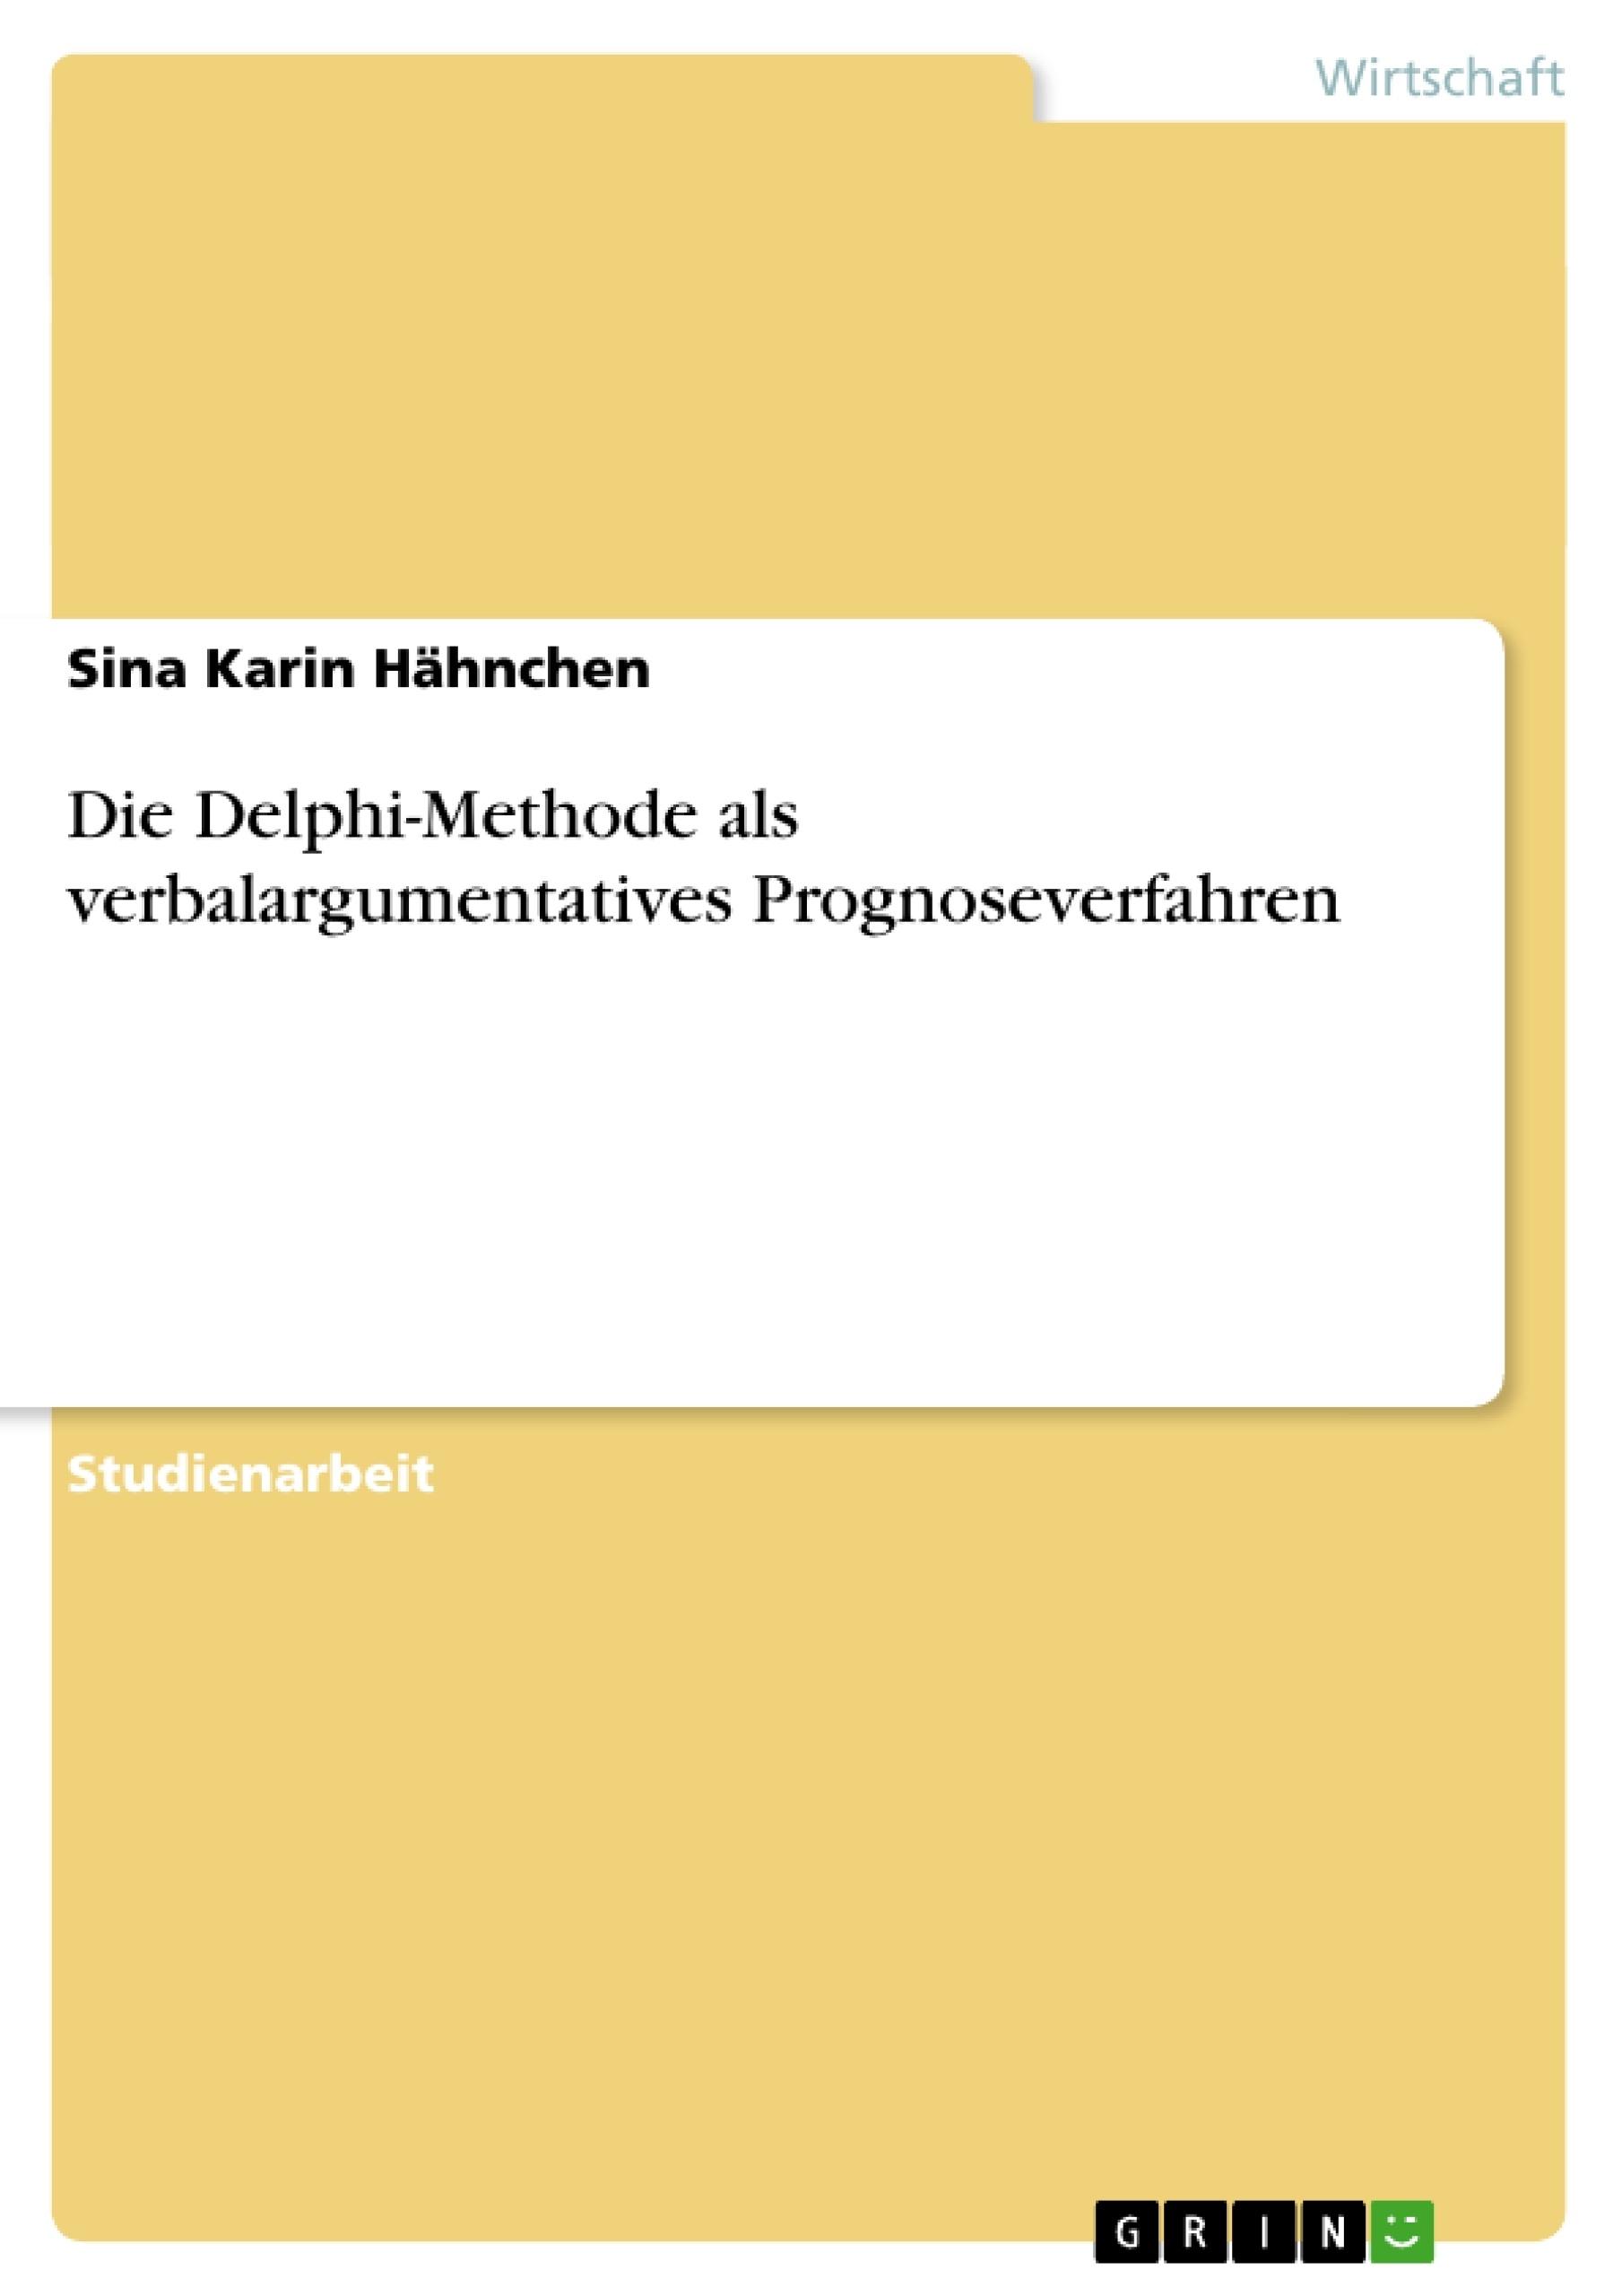 Titel: Die Delphi-Methode als verbalargumentatives Prognoseverfahren